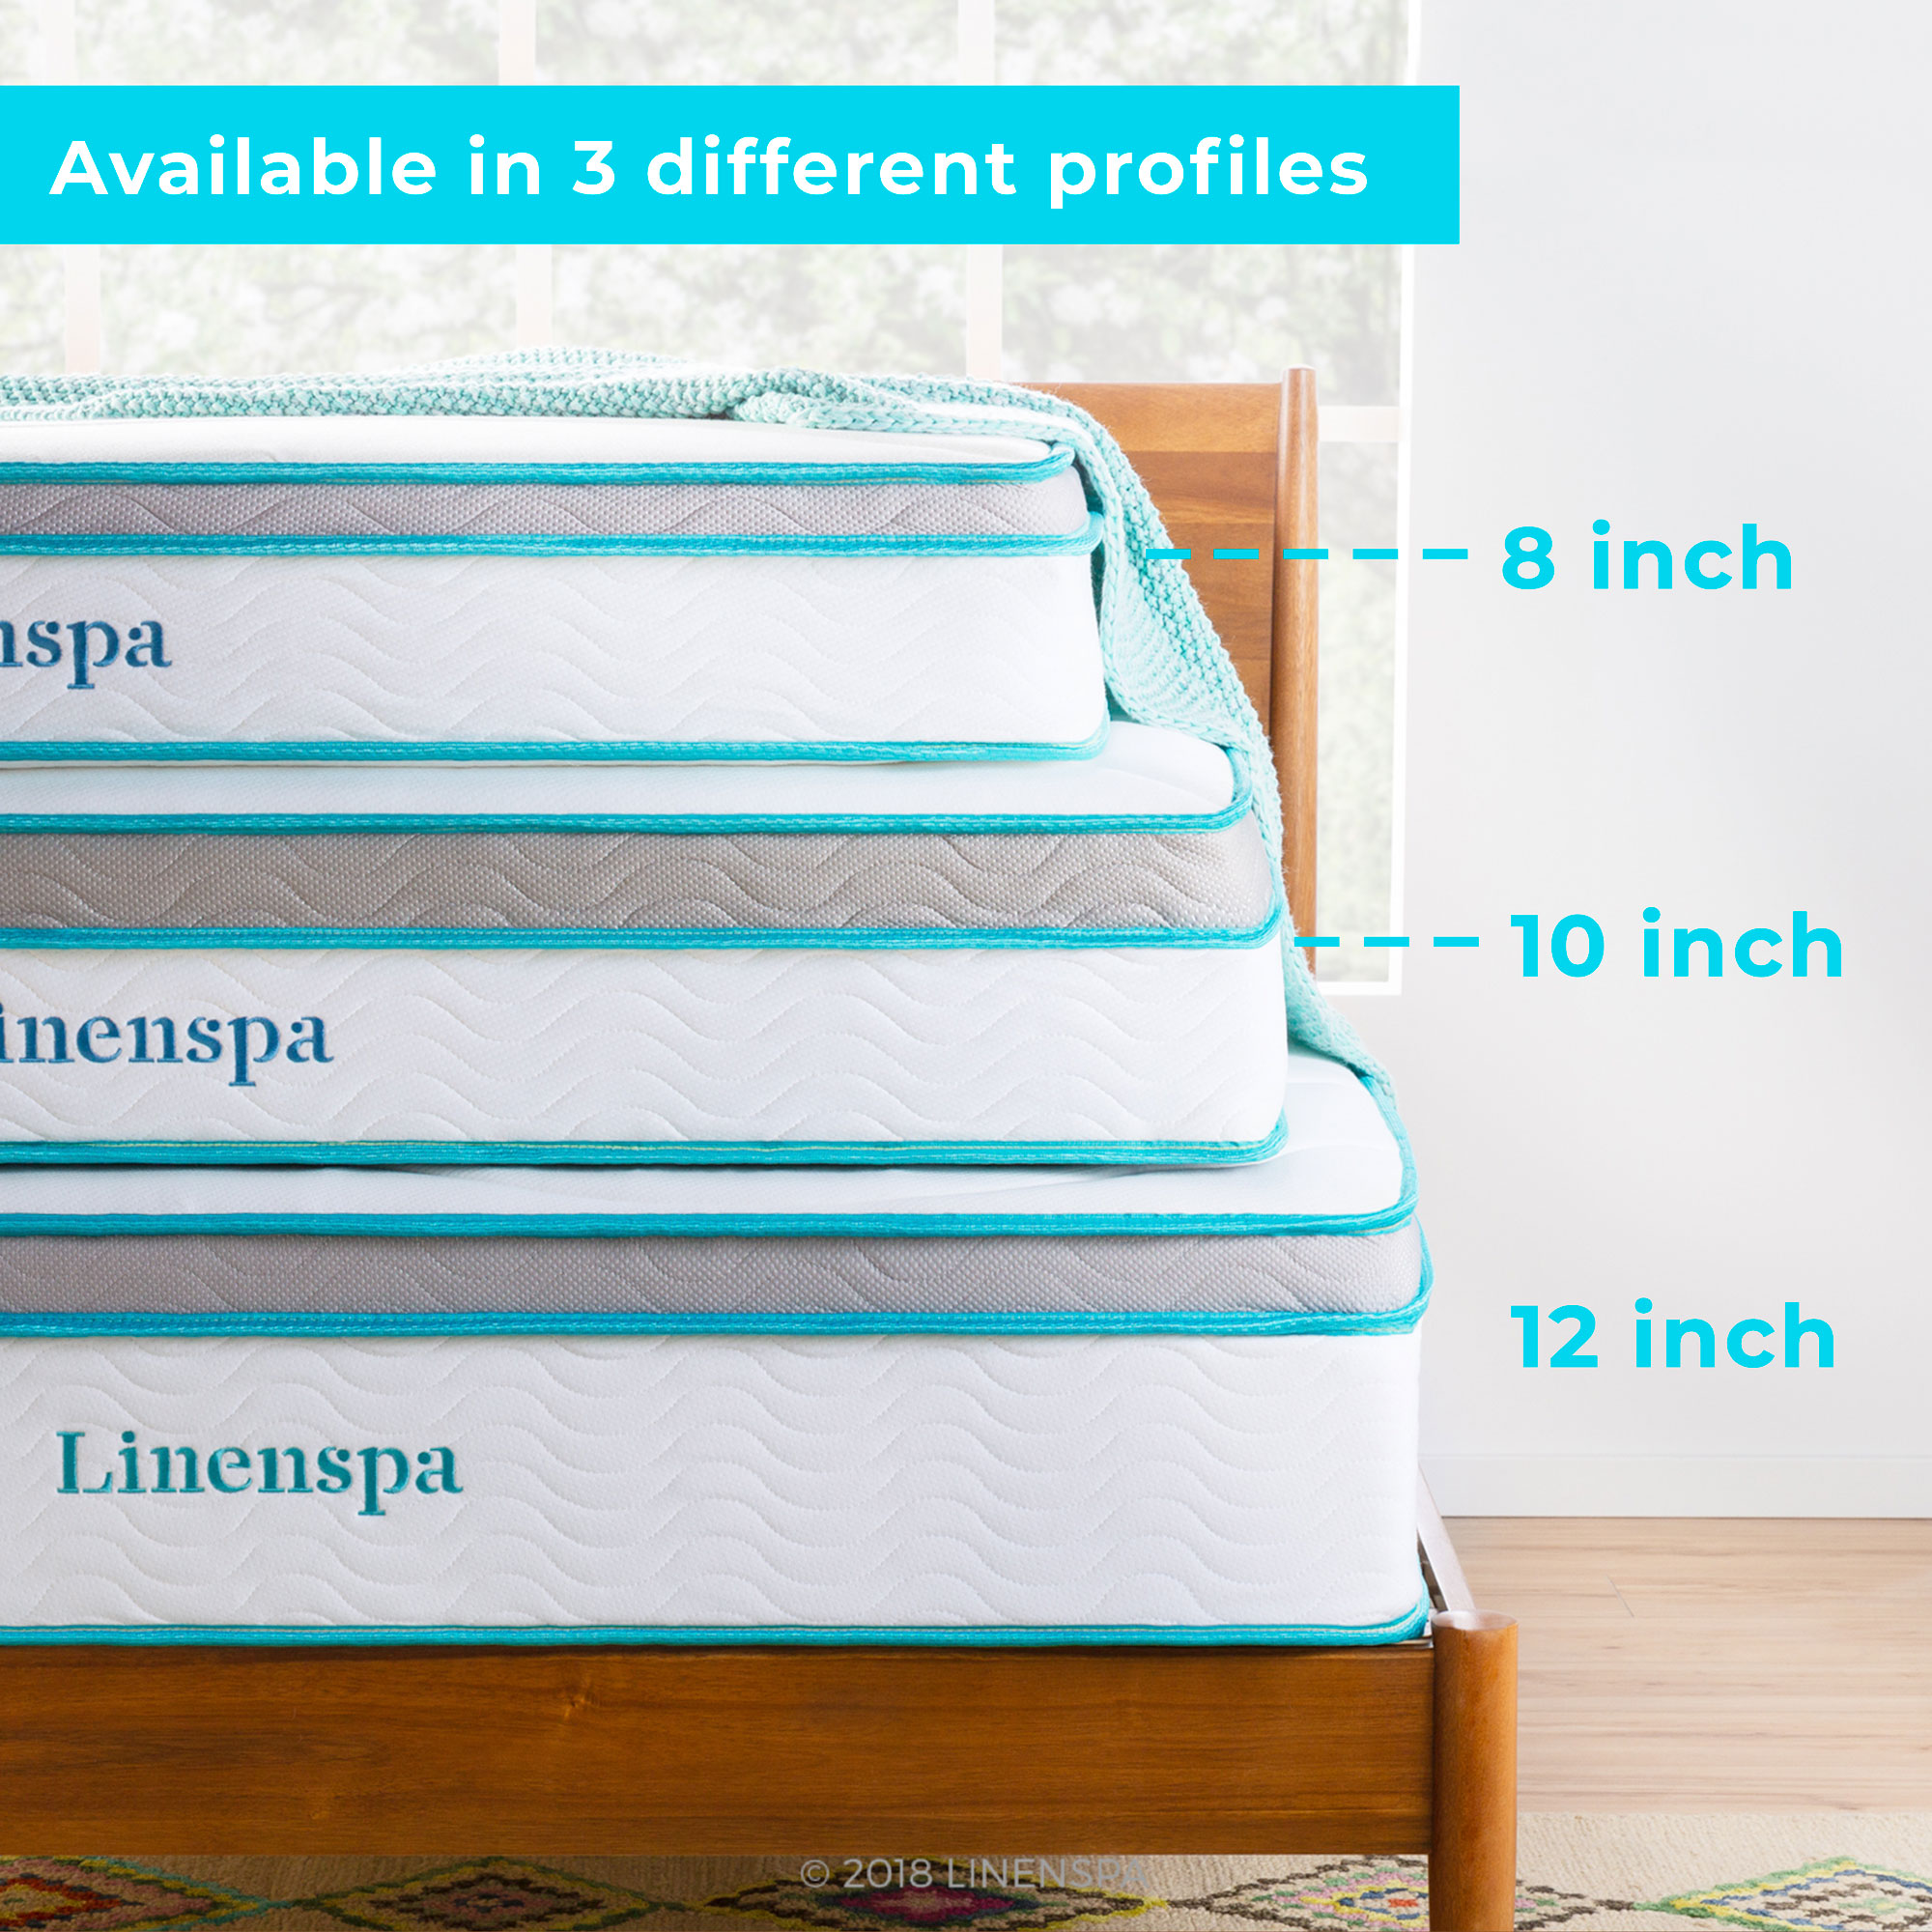 Linenspa Hybrid Mattress Height Profiles